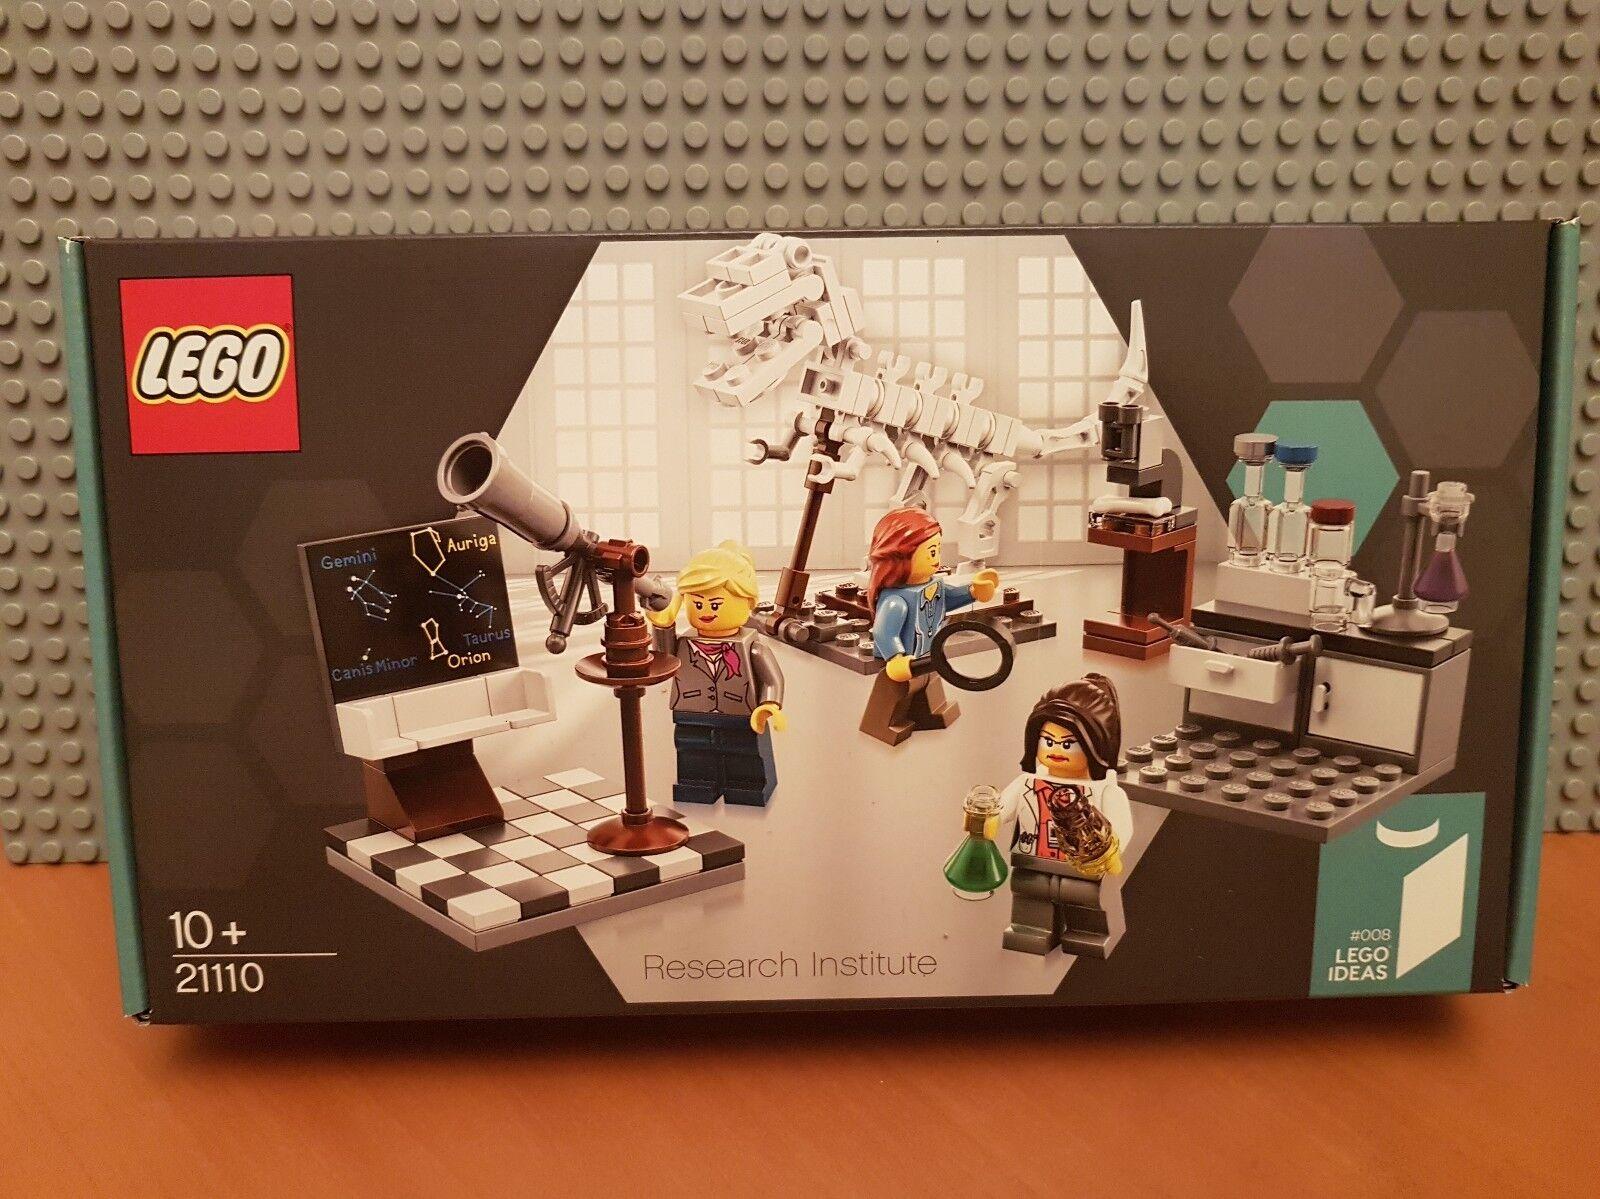 LEGO IDEAS   21110 Research Institute   RARE RETIRED✔ BNIB✔ NEW SEALED✔FAST P&P✔